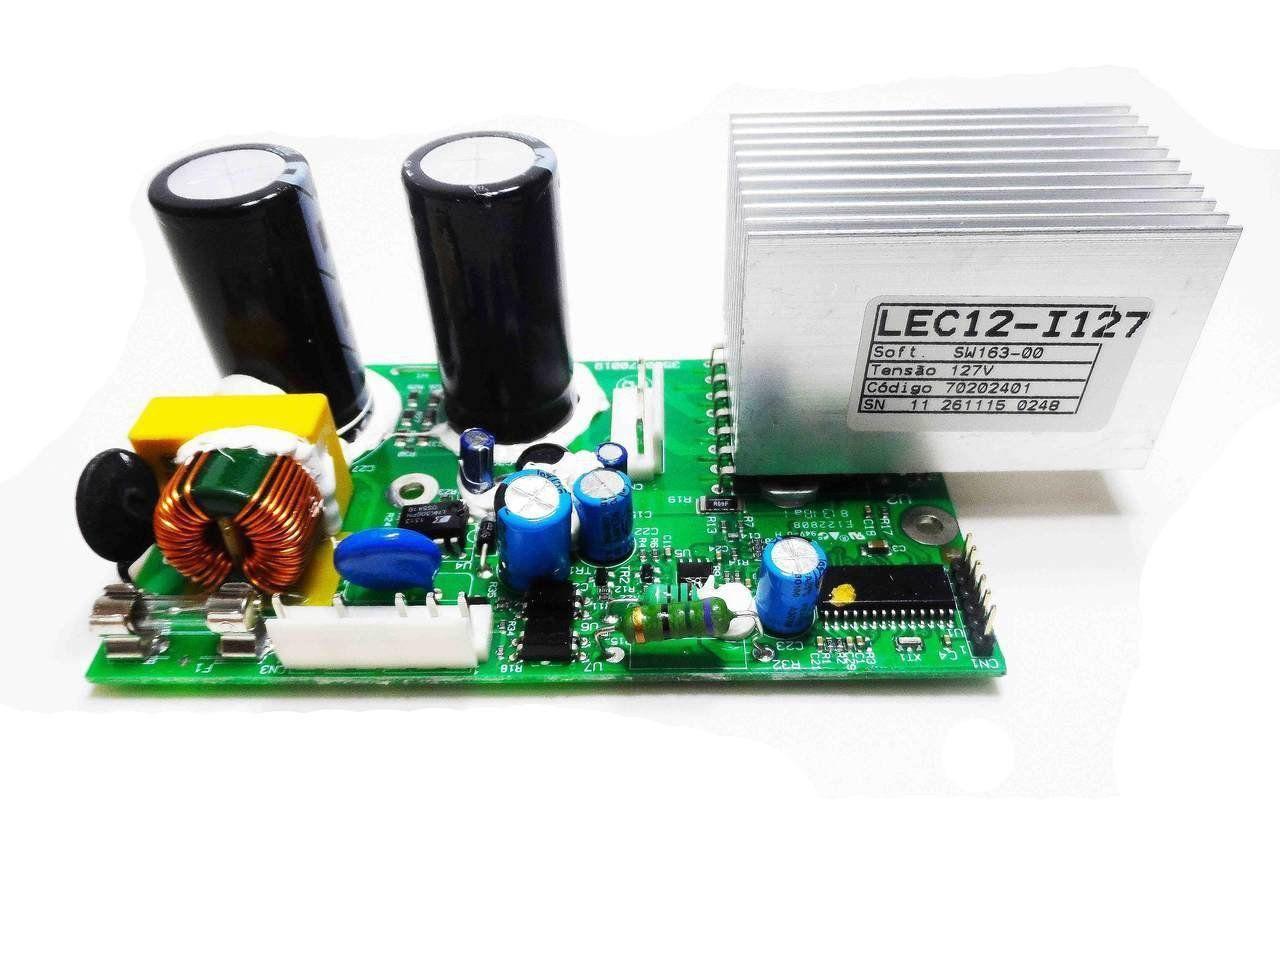 Placa Eletrônica Inversora Lavadora Electrolux.